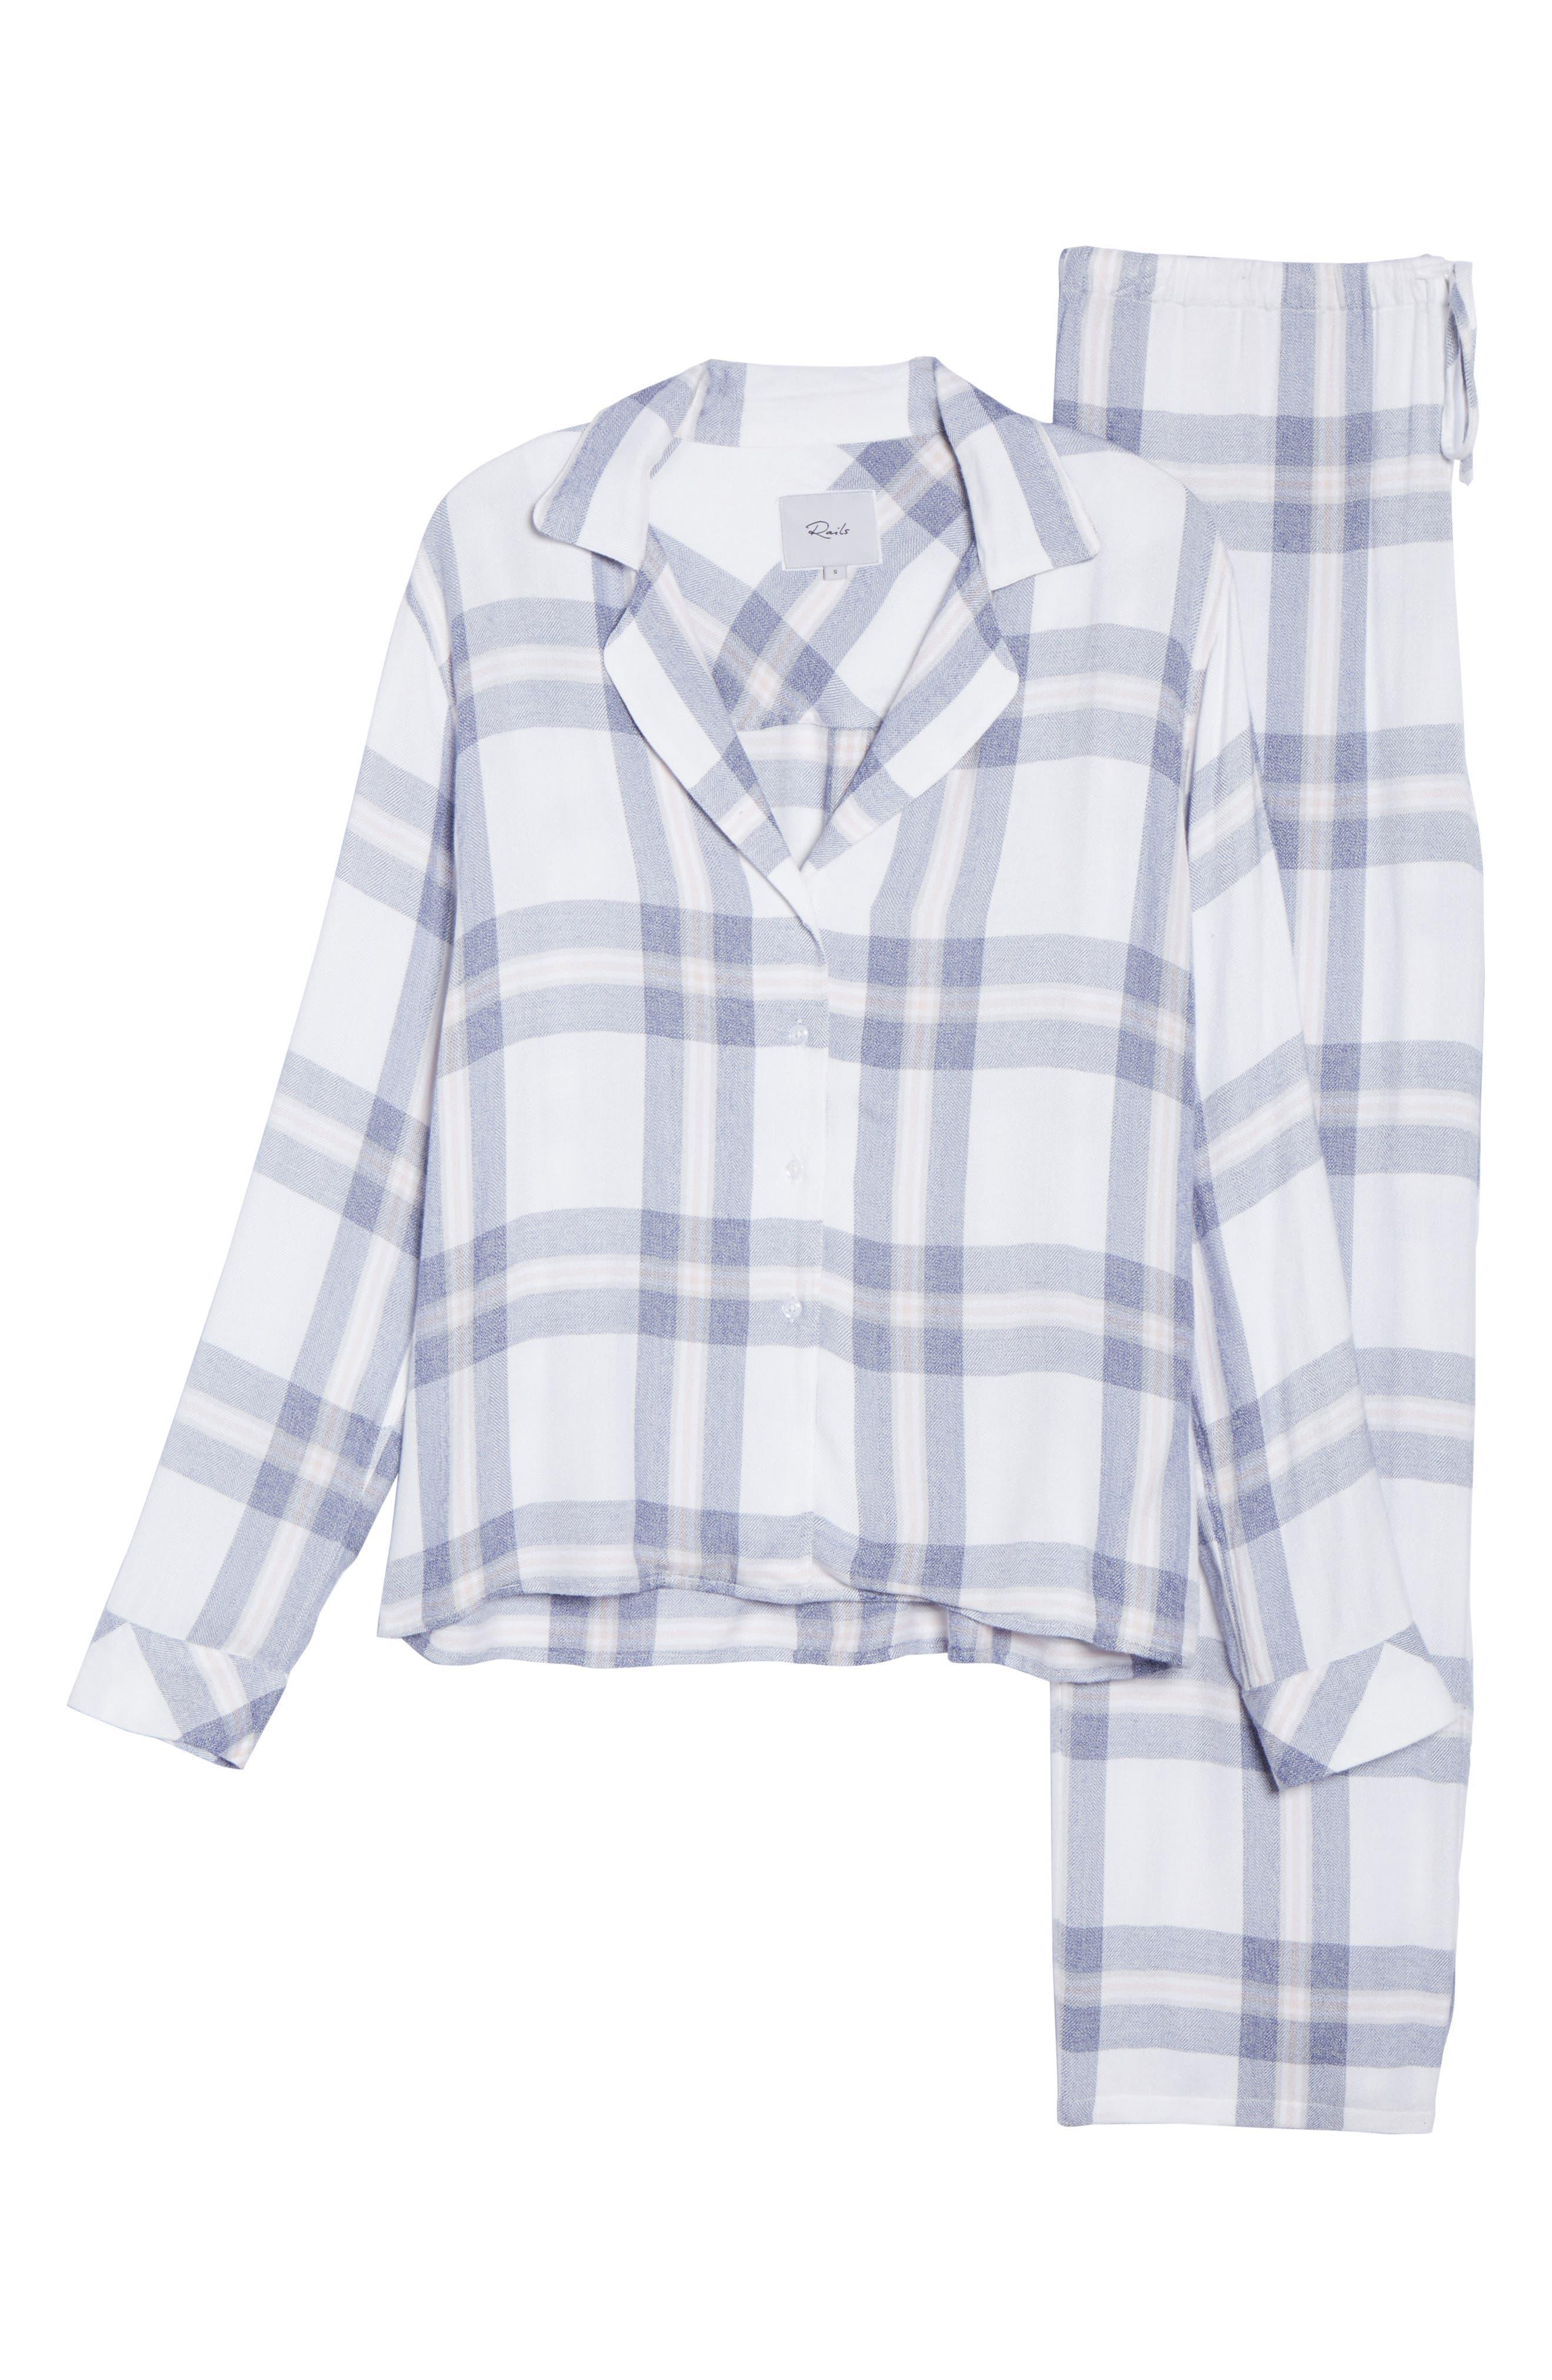 Plaid Pajamas,                             Alternate thumbnail 6, color,                             WHITE/ CHAMBRAY/ PETAL